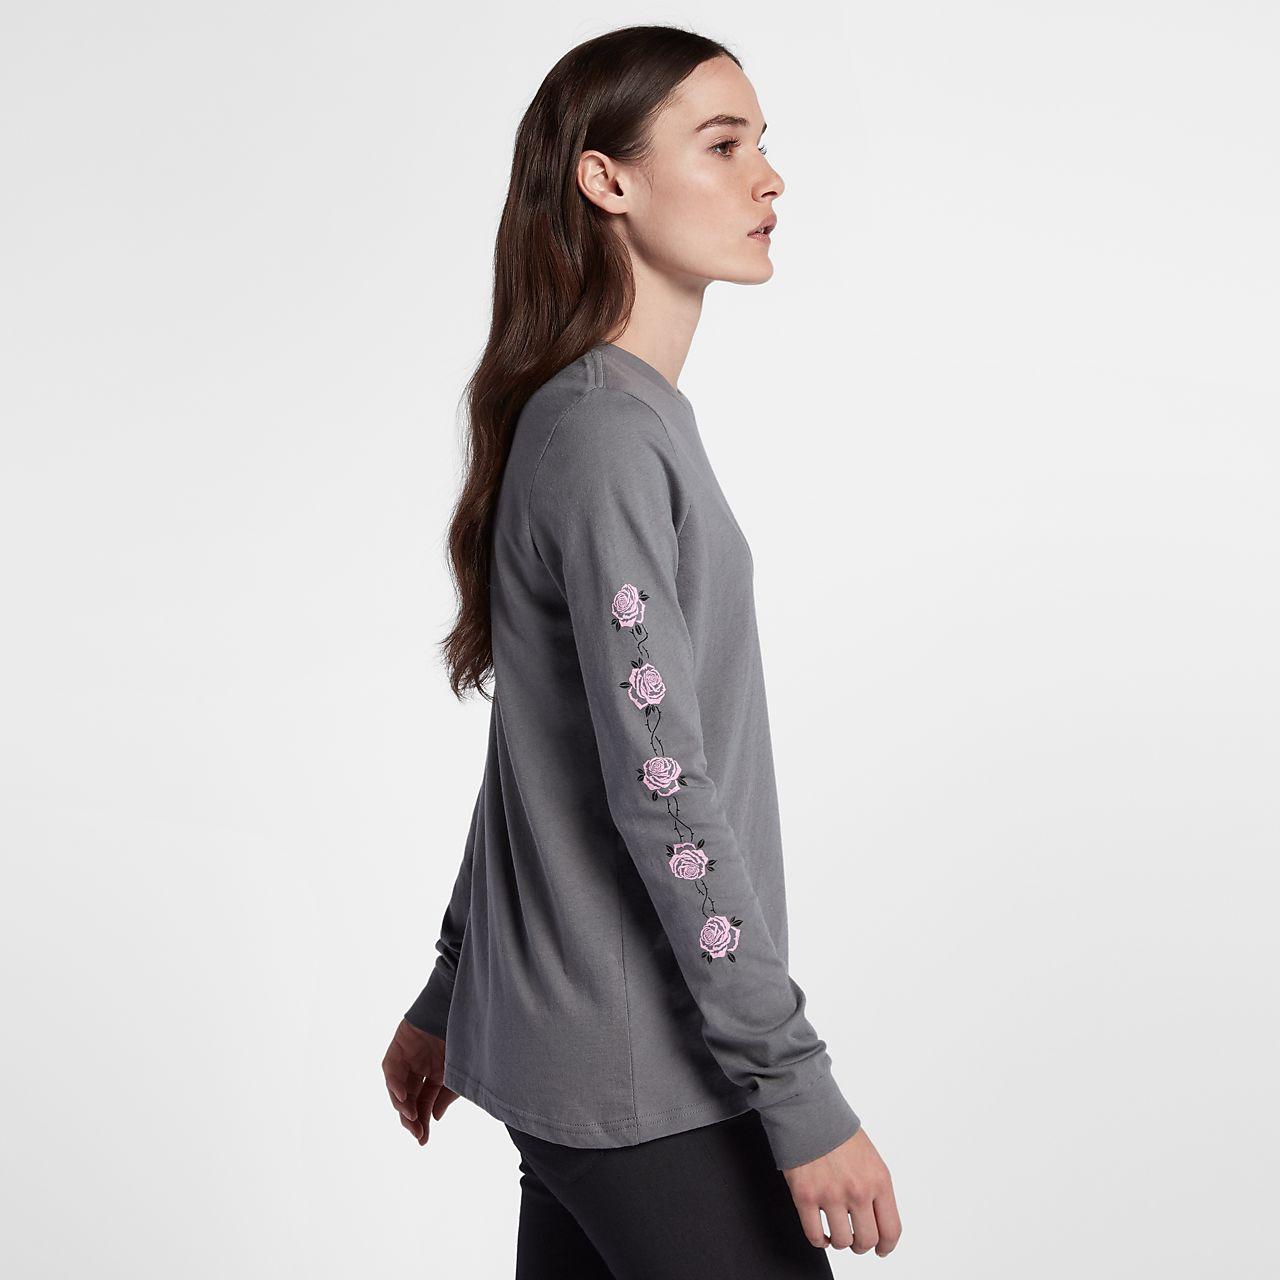 Hurley Light Streak Women's Long Sleeve T-Shirt. Nike.com